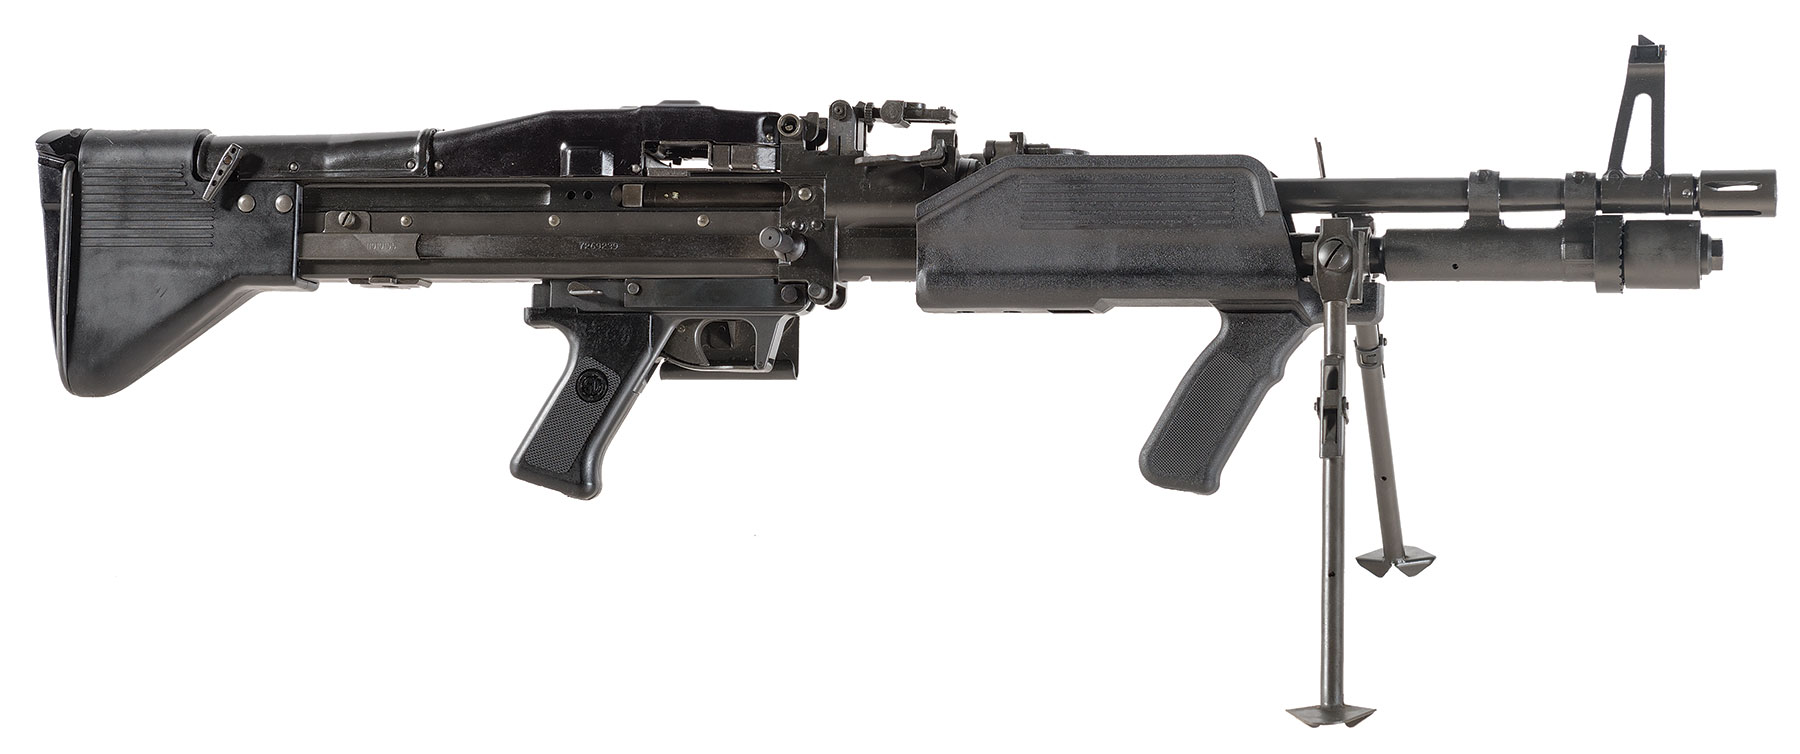 catco m60 belt fed machine gun fully transferrable